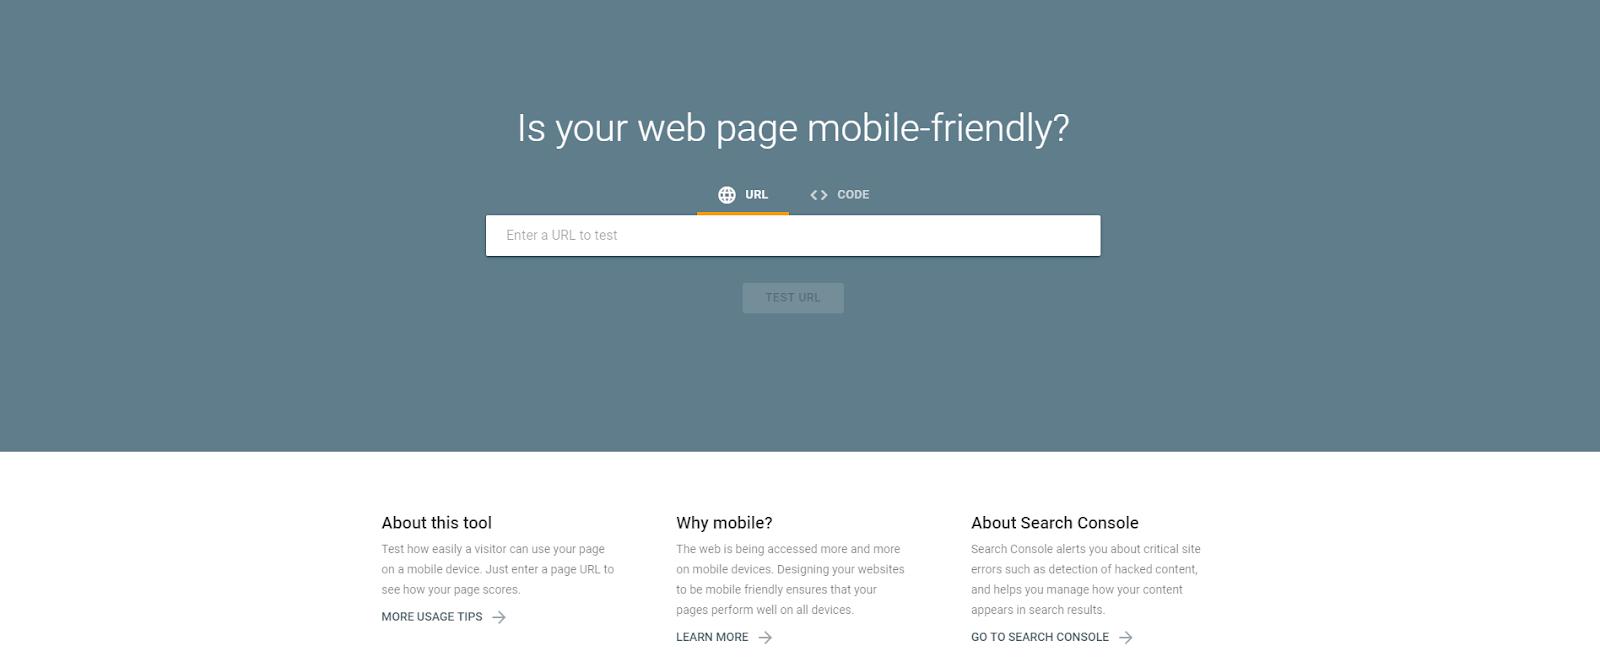 advantage of Google mobile-friendly tool